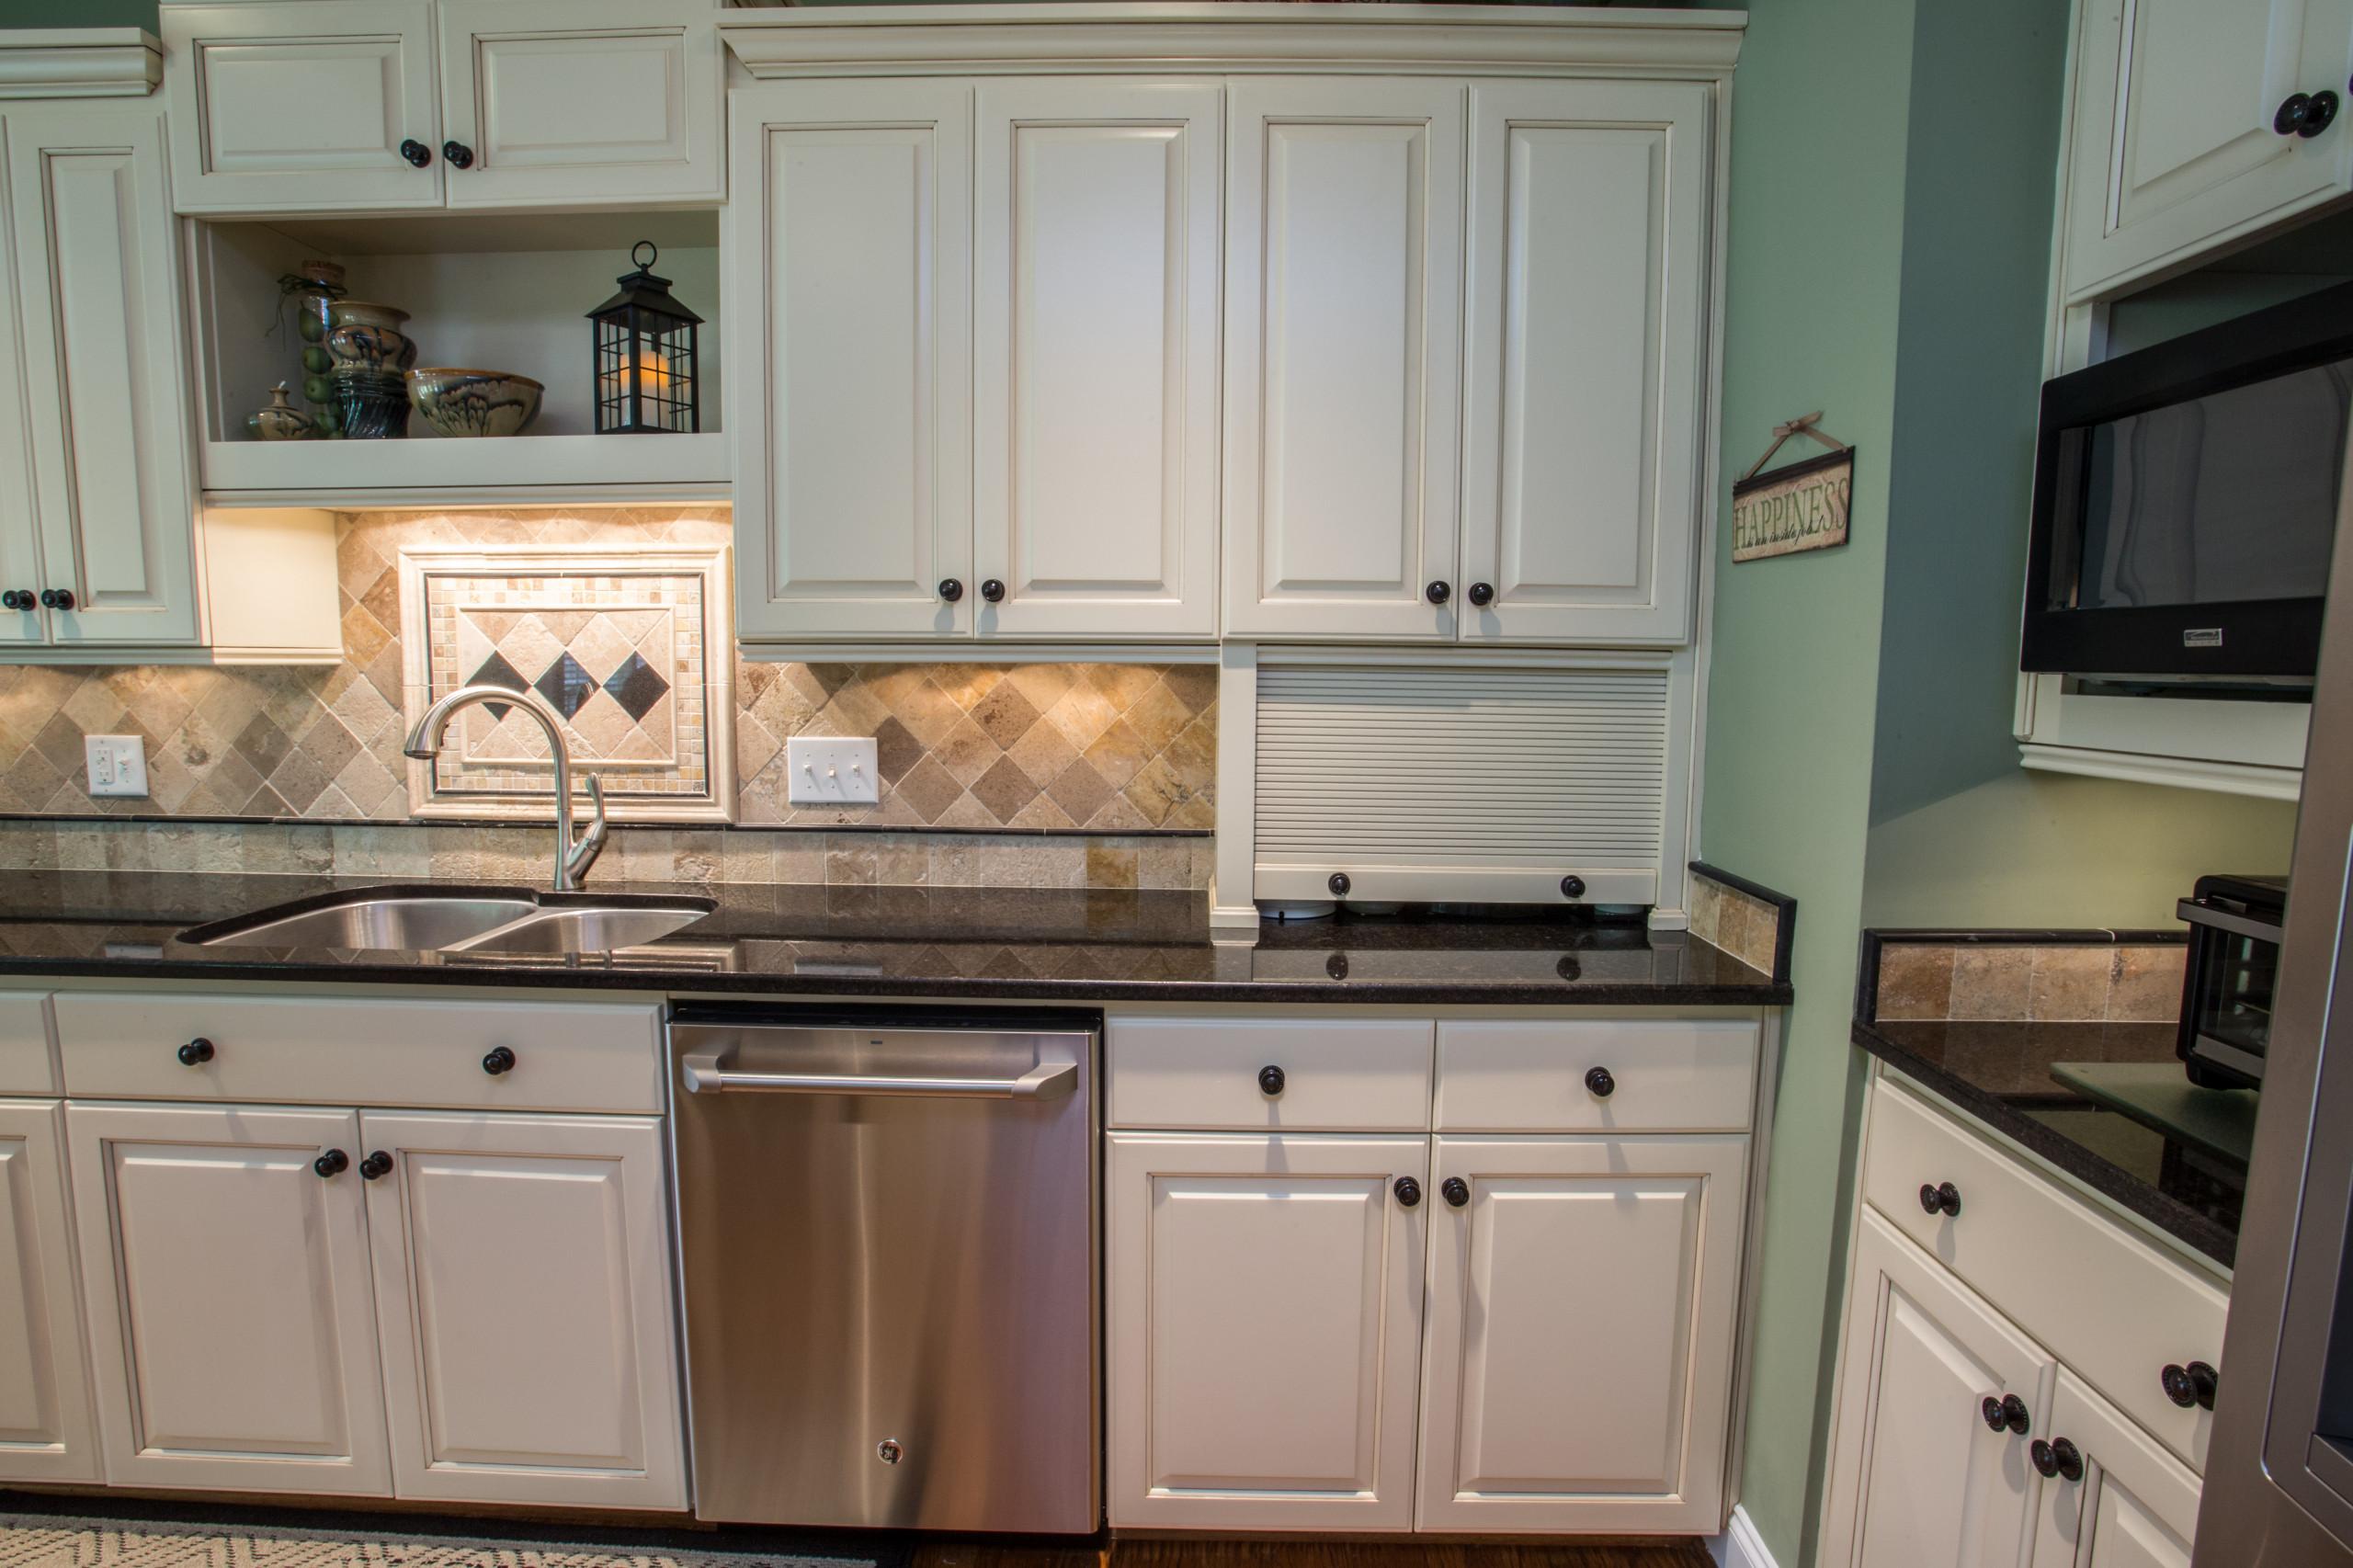 Kitchen After Undercounter Lighting